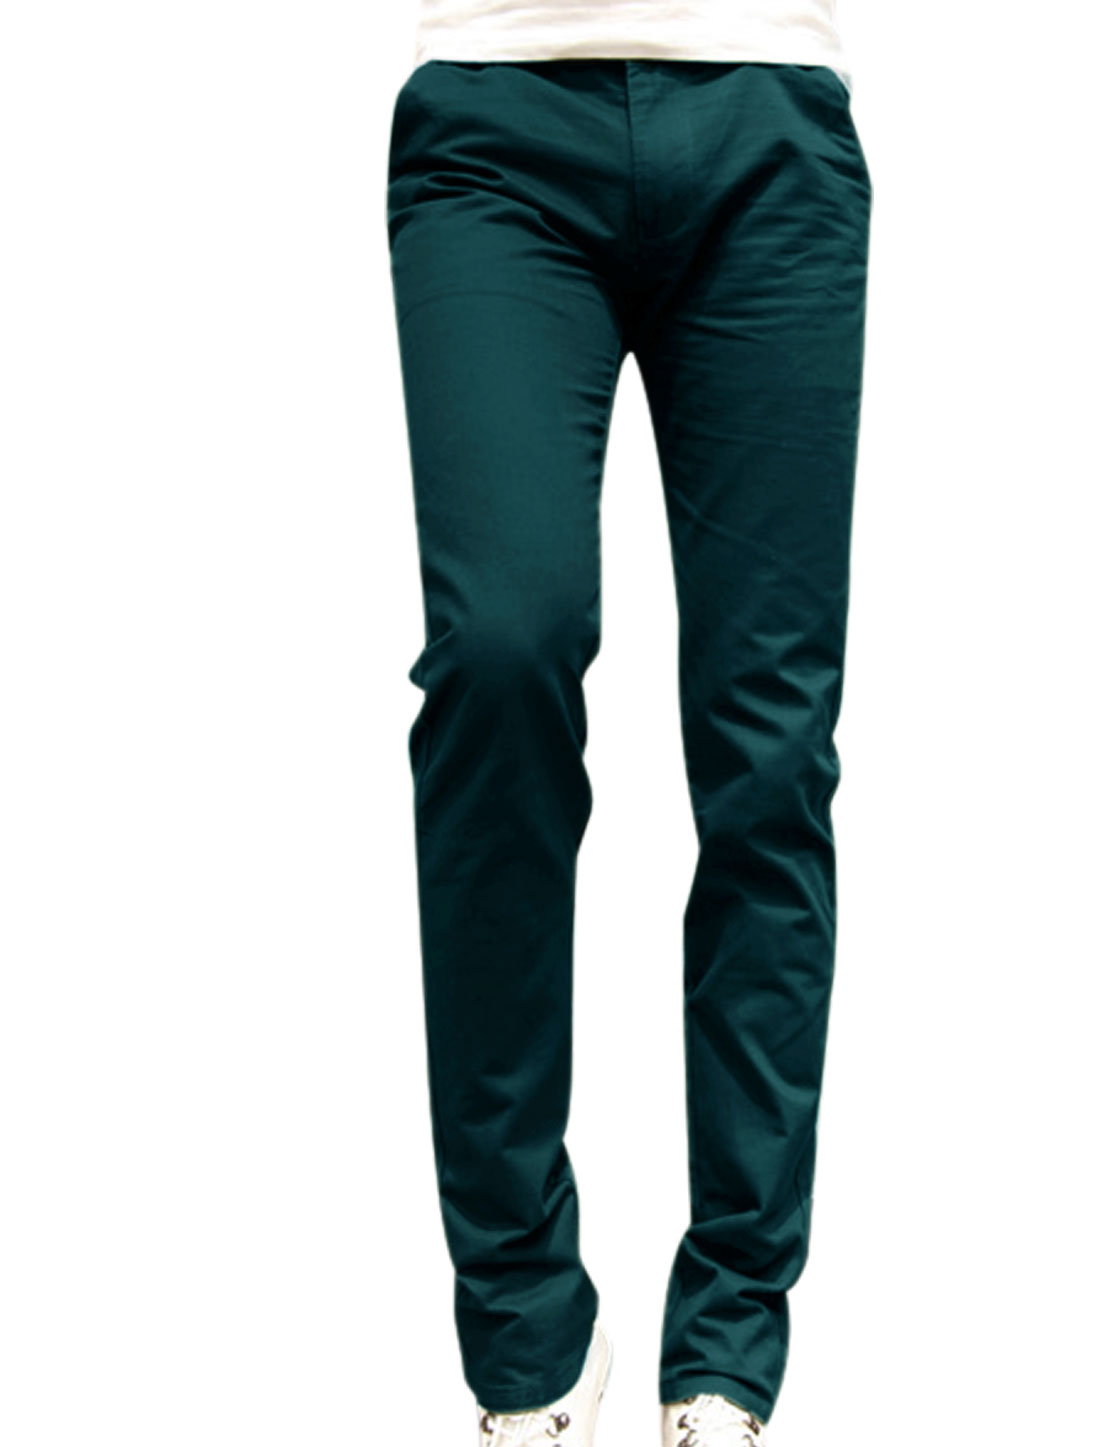 Men New Style Double Pocket Sides Zip Fly Navy Blue Straight Leg Pants W30